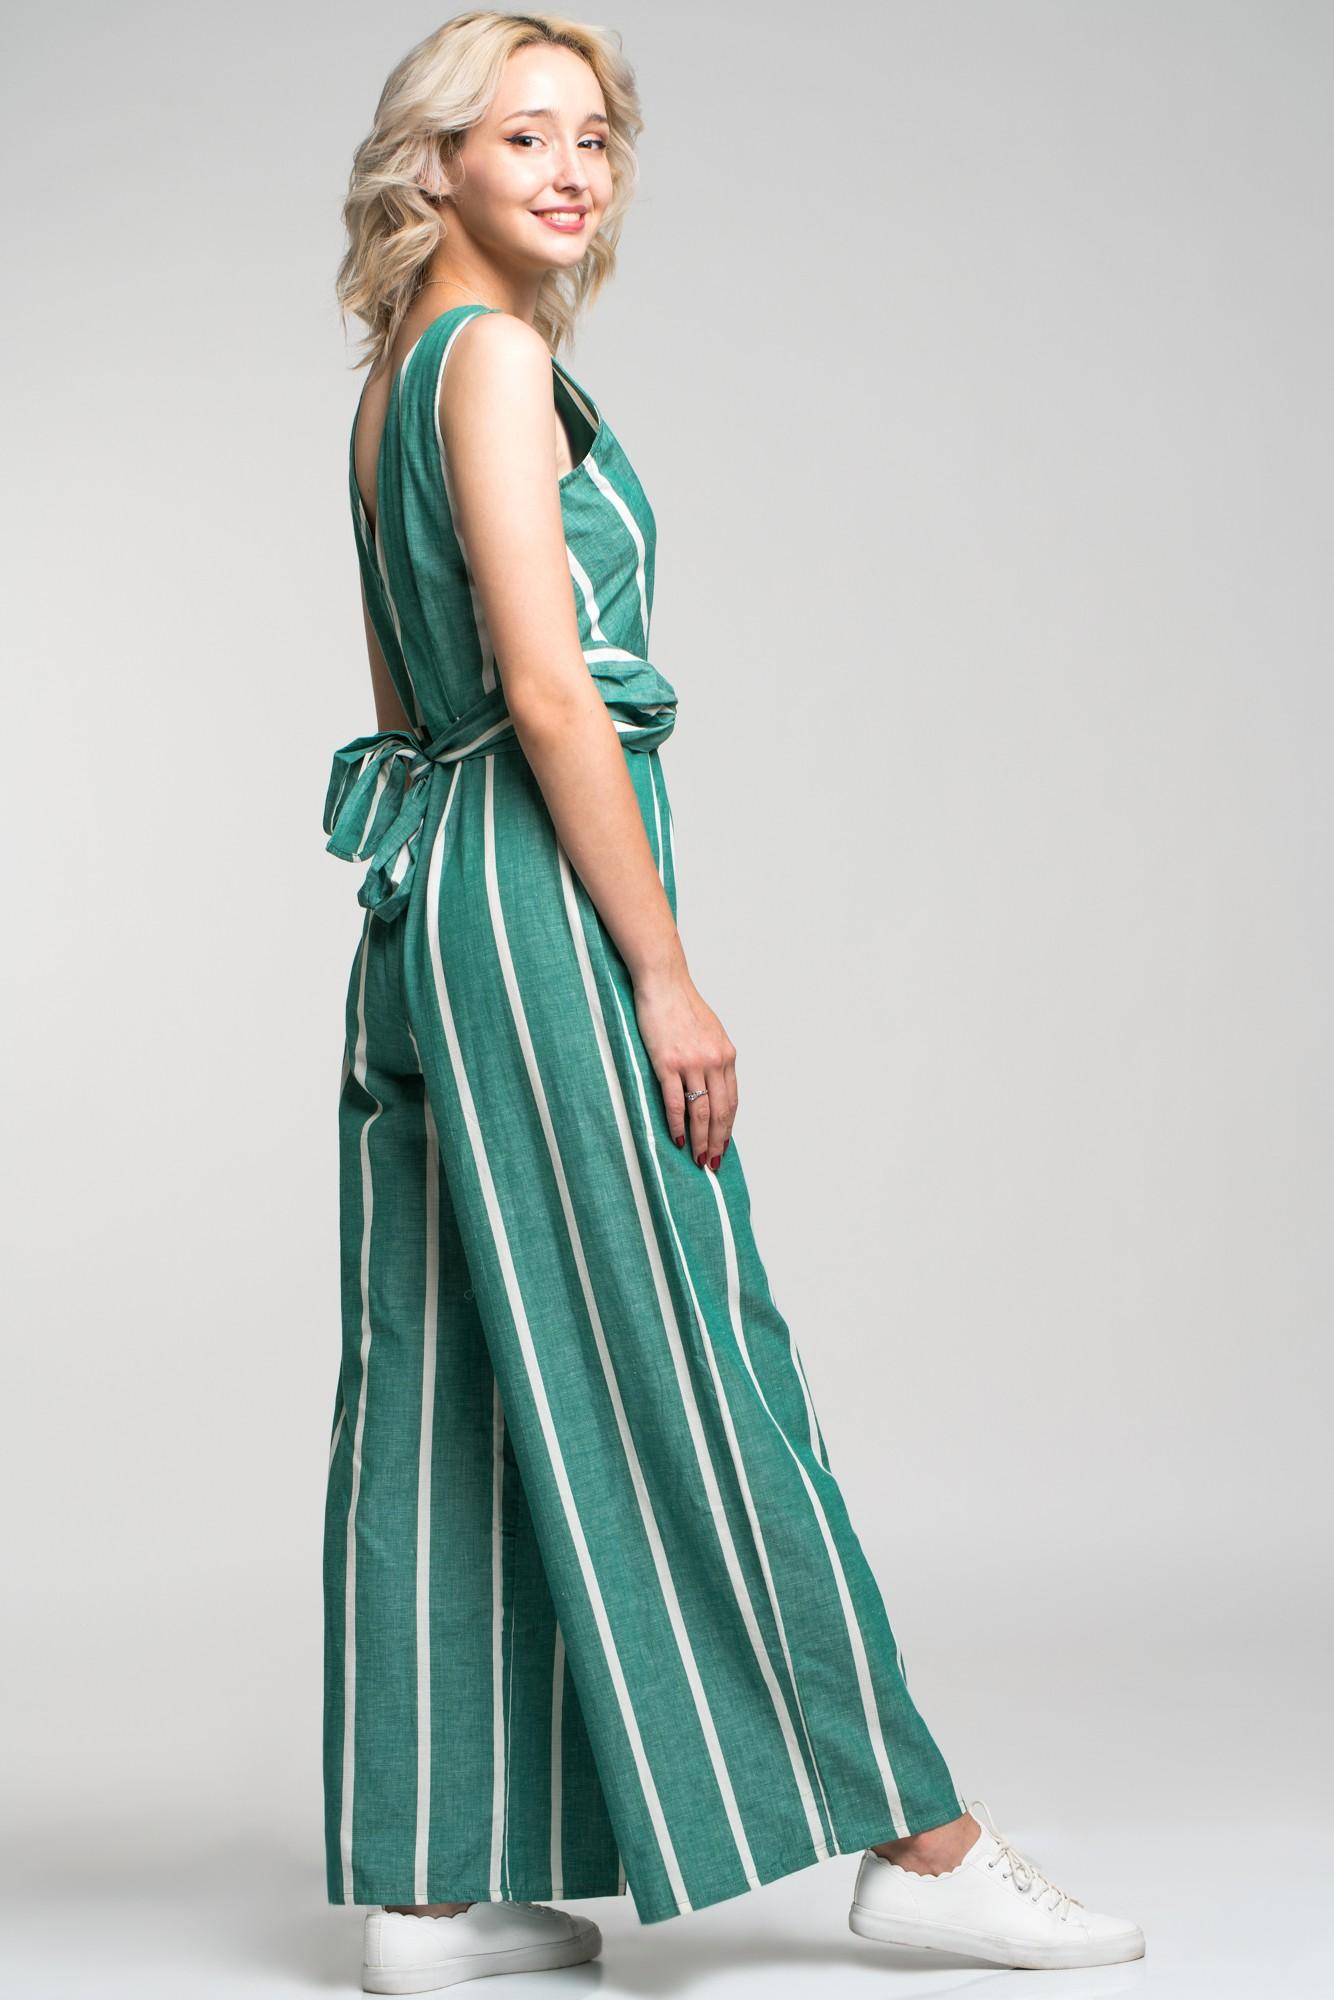 Salopeta verde din in cu dungi albe si cordon in talie